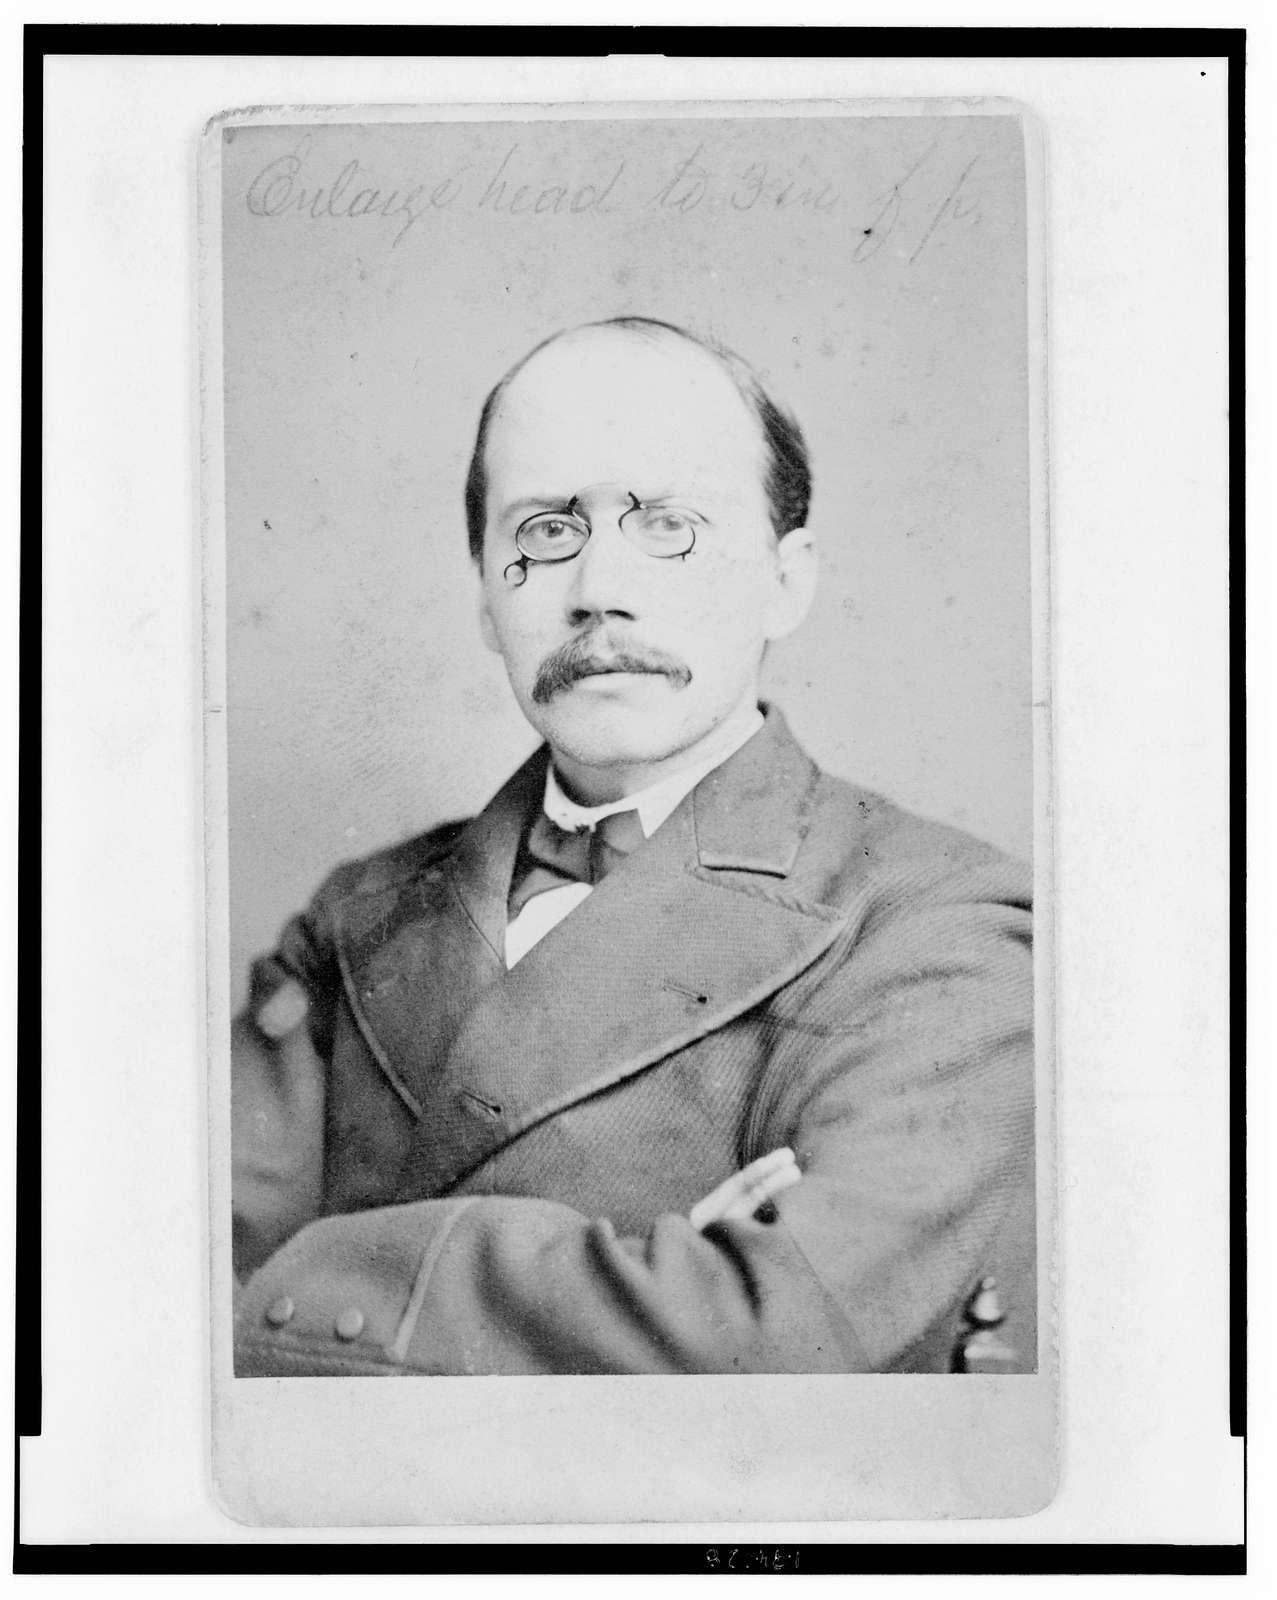 [Charles Herber Clark, author (pen name, Max Adler), half-length portrait, facing front] / Gutekunst.